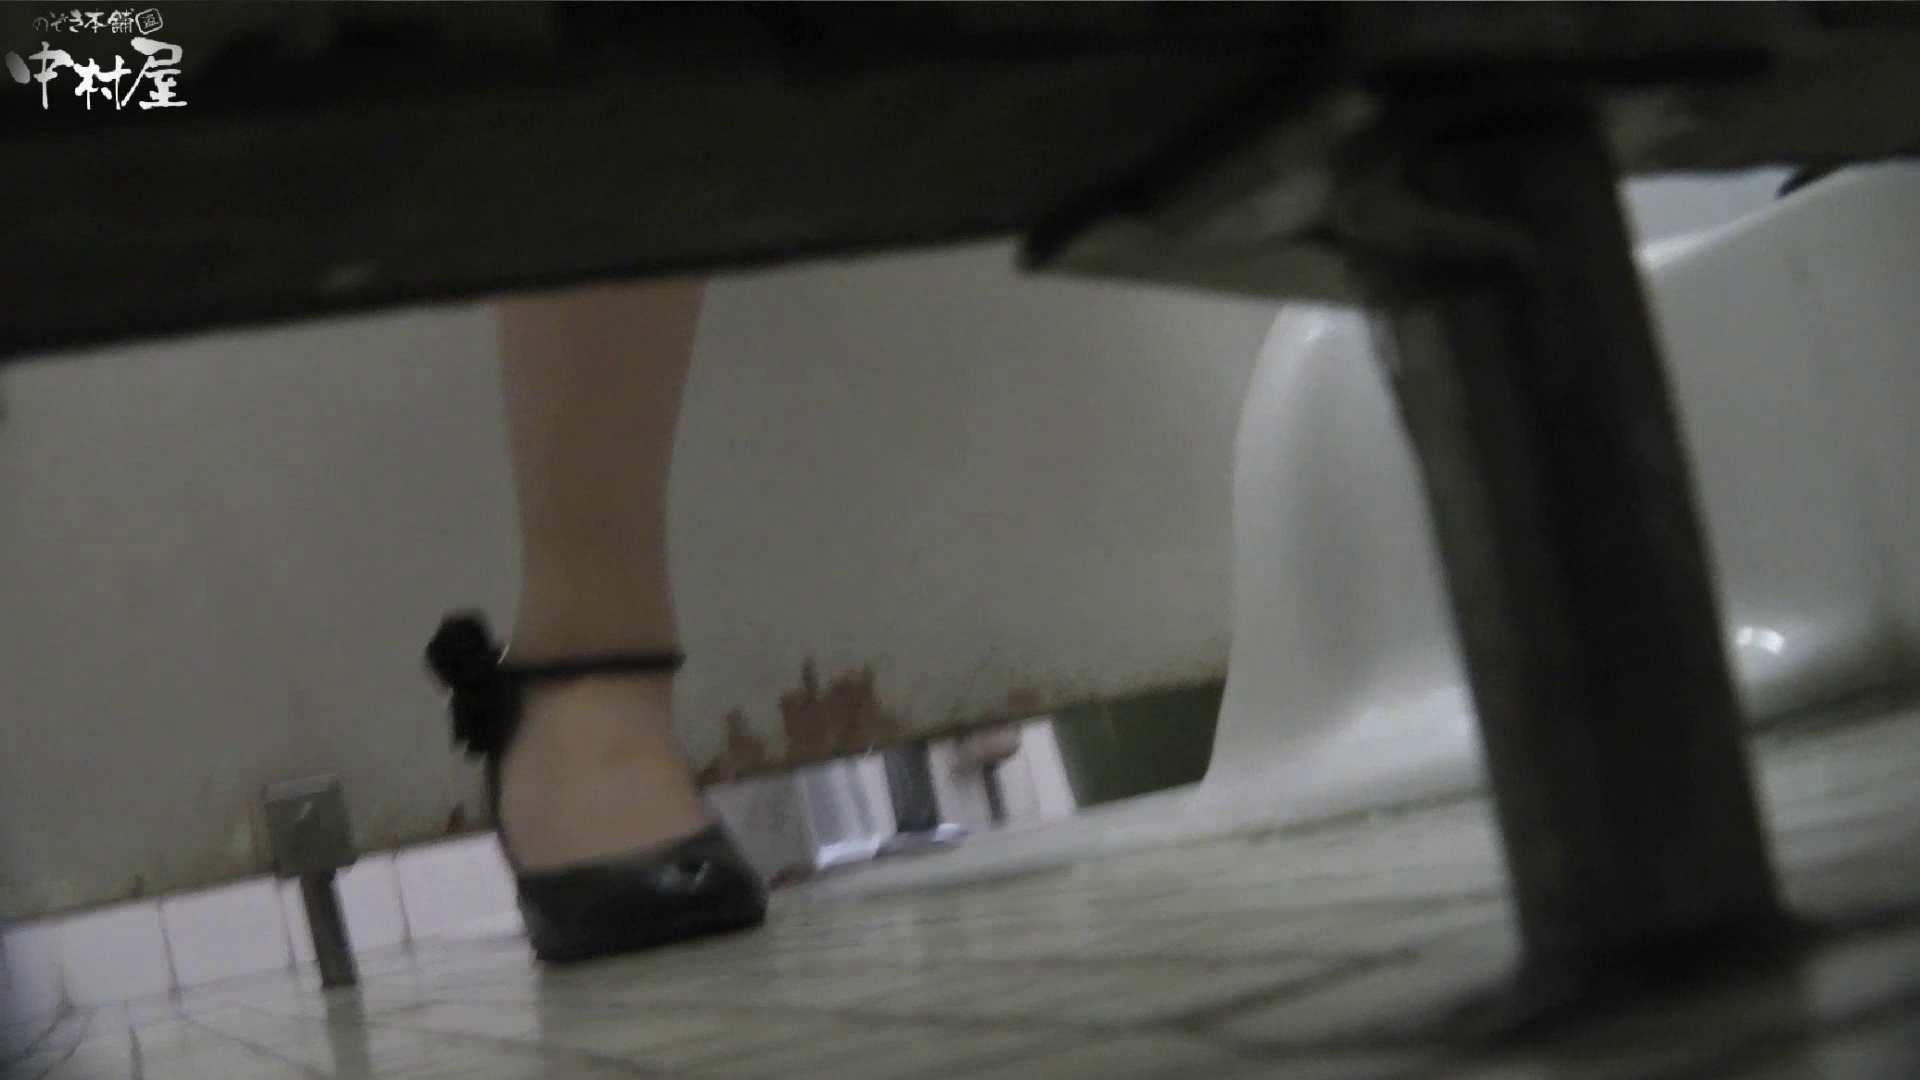 vol.08 命がけ潜伏洗面所! わかめ酒タラタラ プライベート | 洗面所  97pic 2